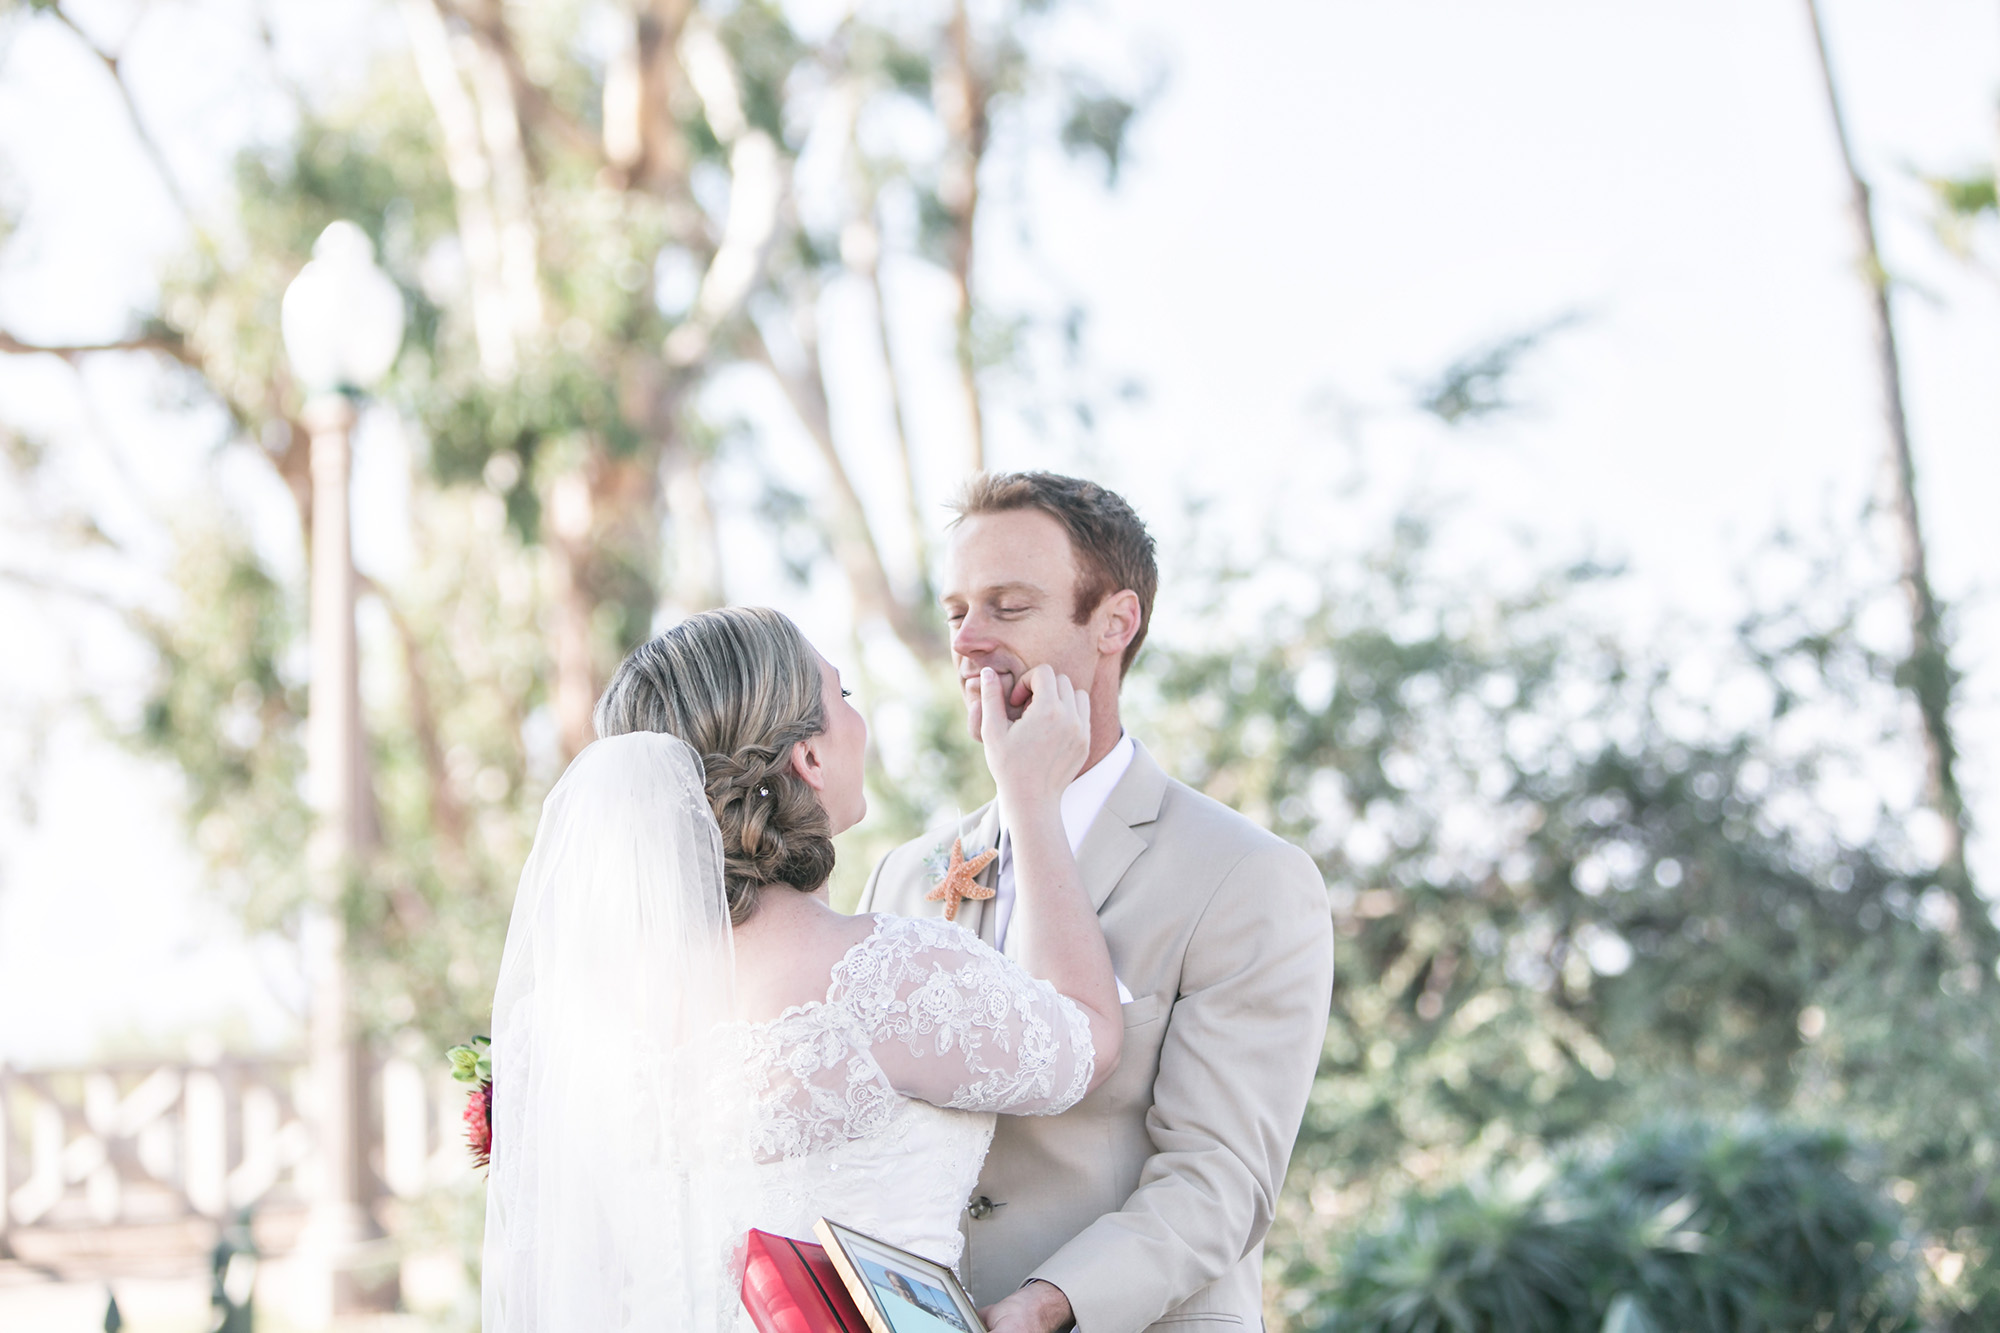 unforgettable-st-monica-wedding-carrie-vines-photography-022.jpg